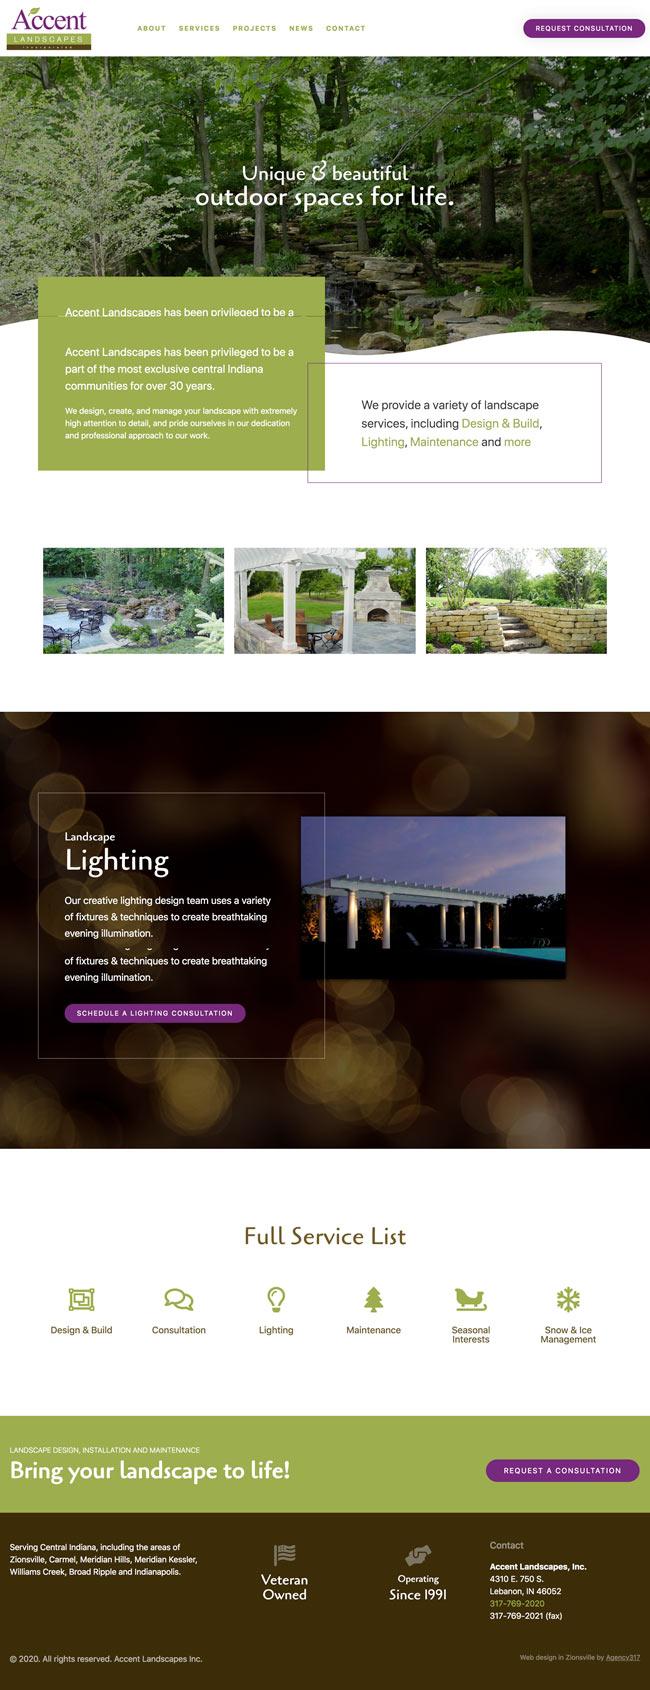 Homepage Web Design - Accent Landscapes